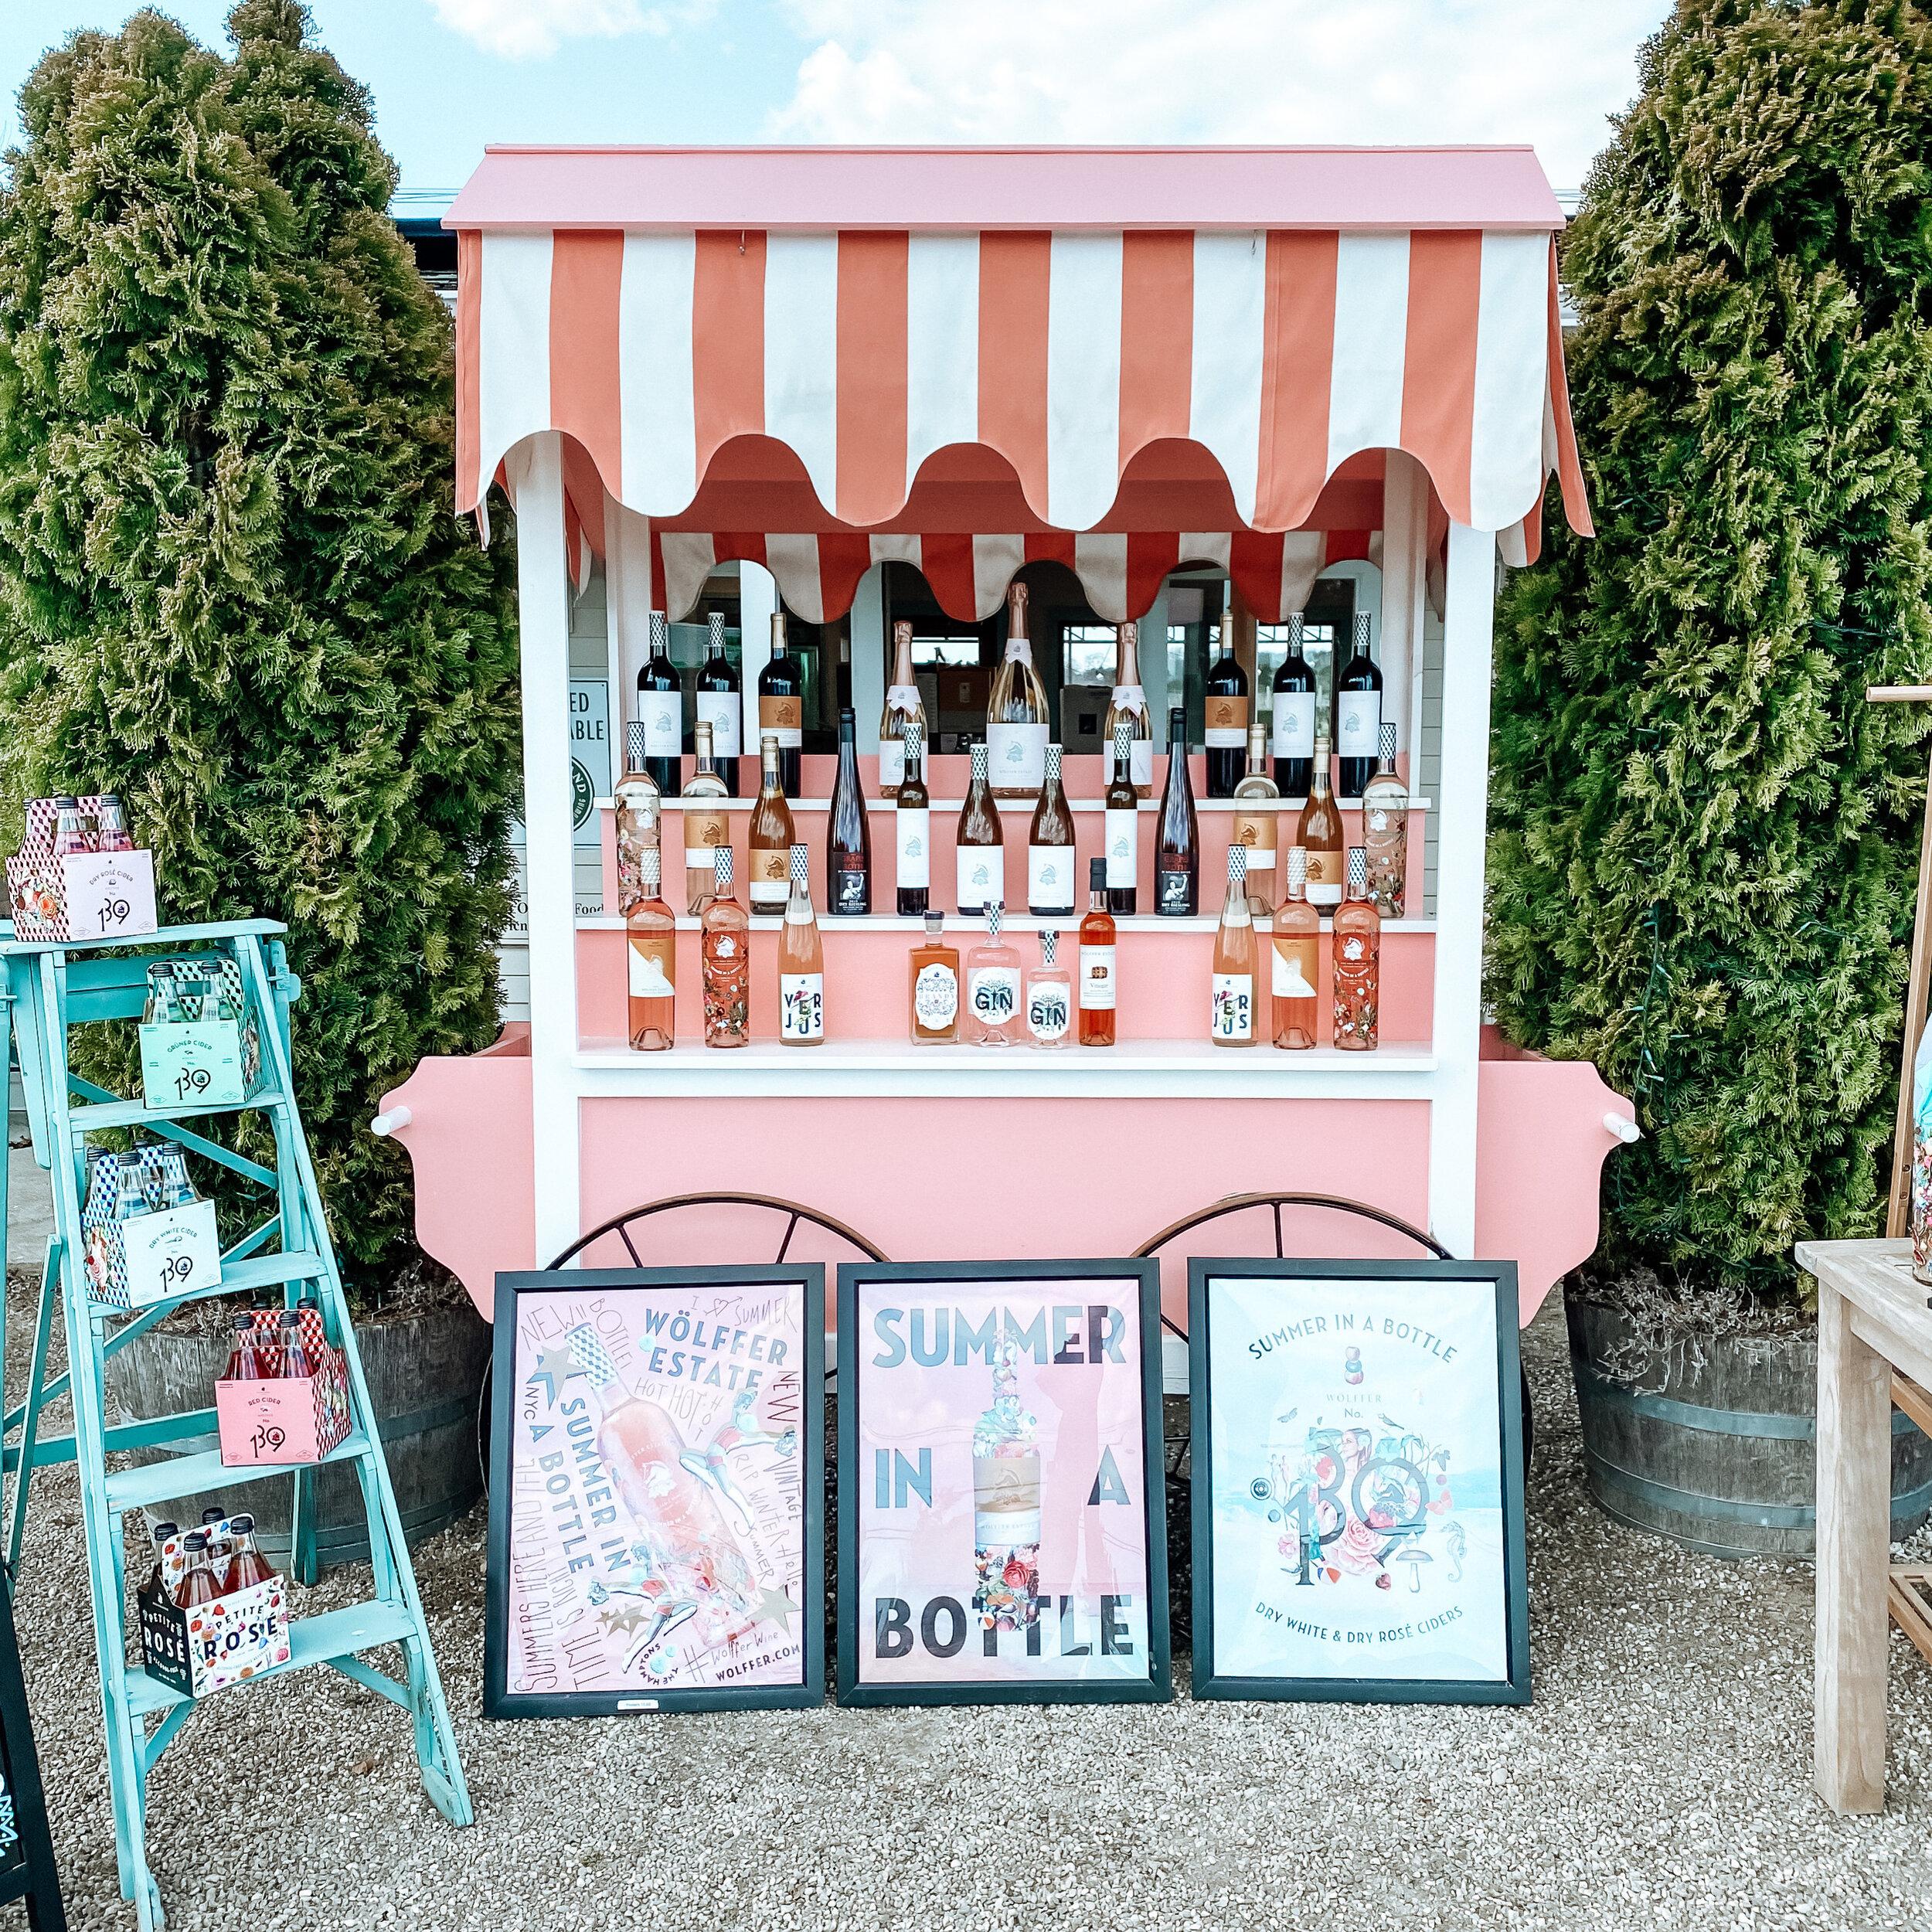 wolffer estate wine stand ⌁ SAGAPONACK, ny -